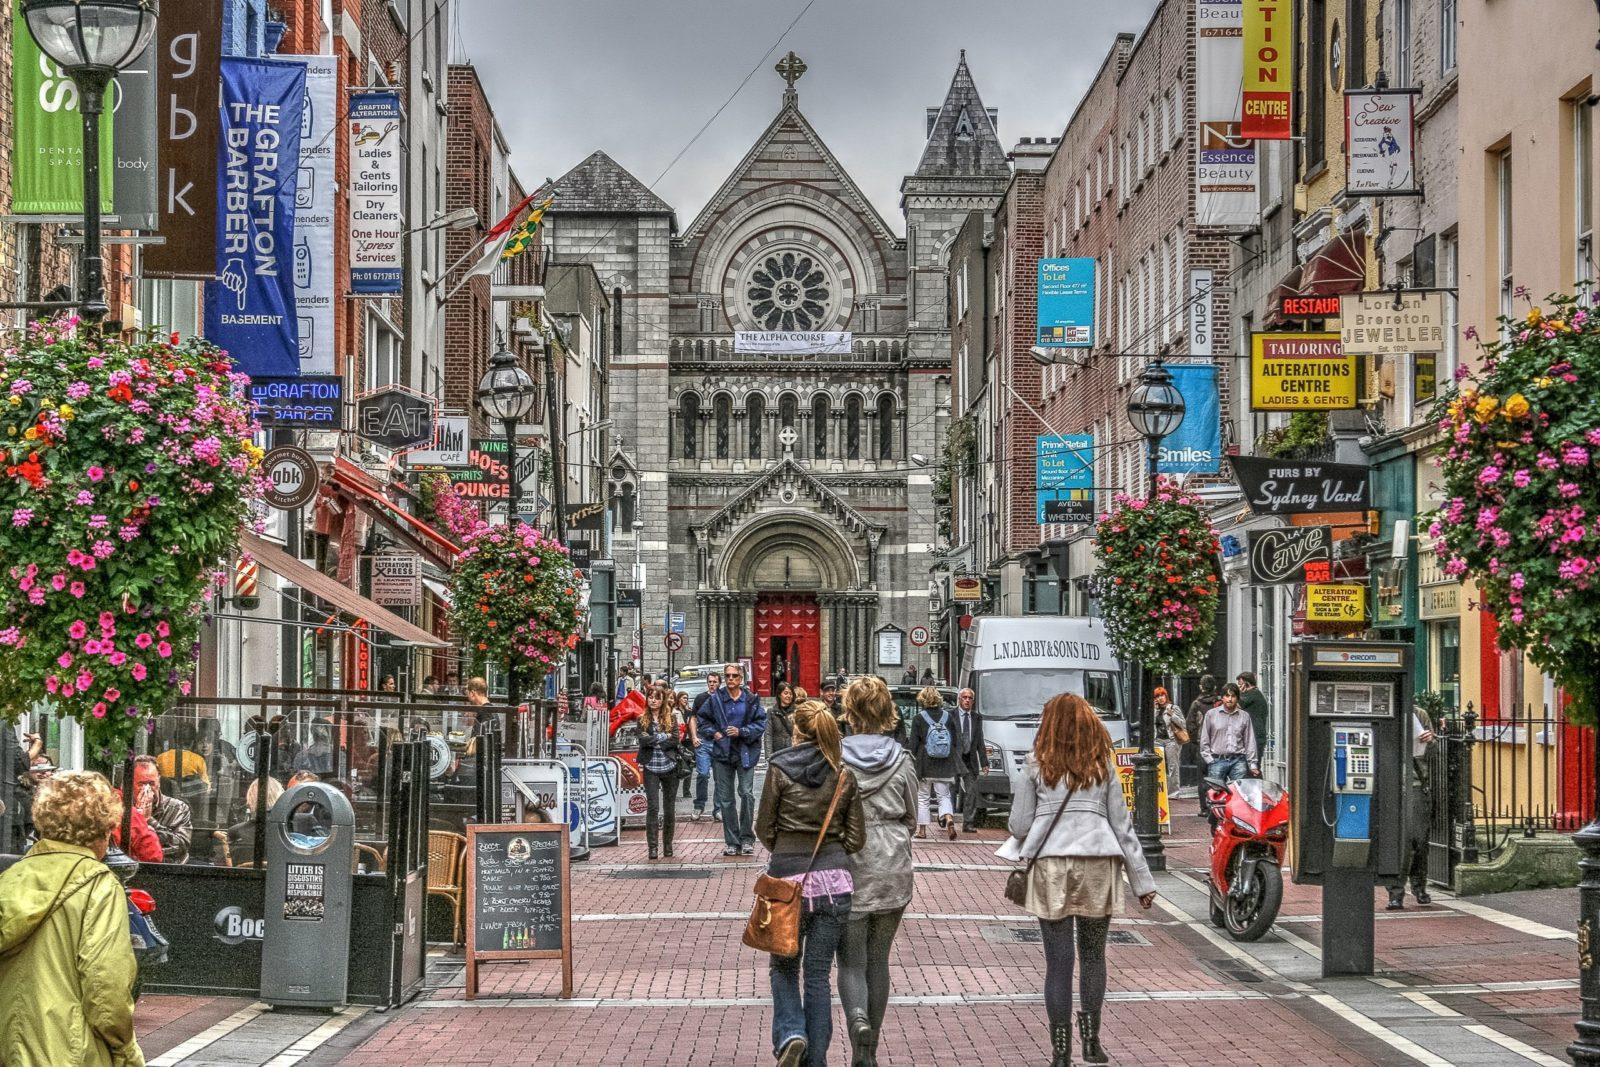 Dublin scaled - ავიაბილეთები დუბლინი